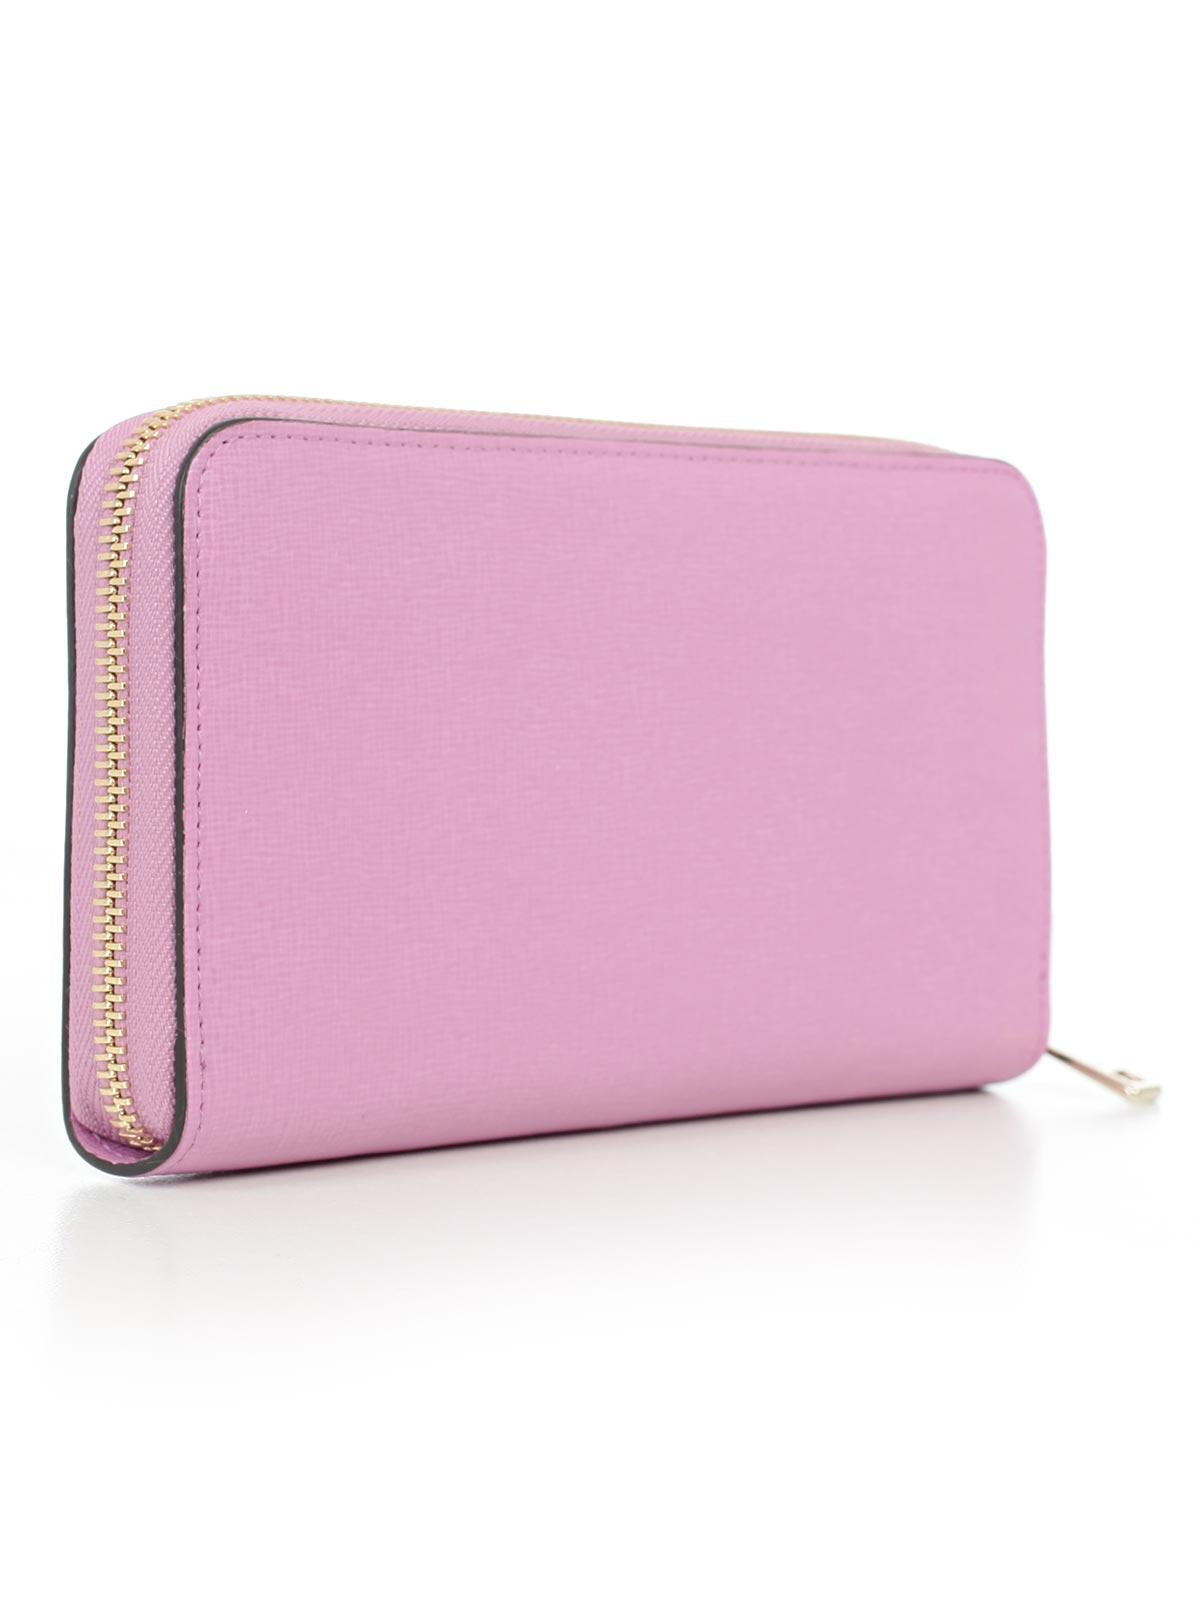 Picture of Furla Wallet